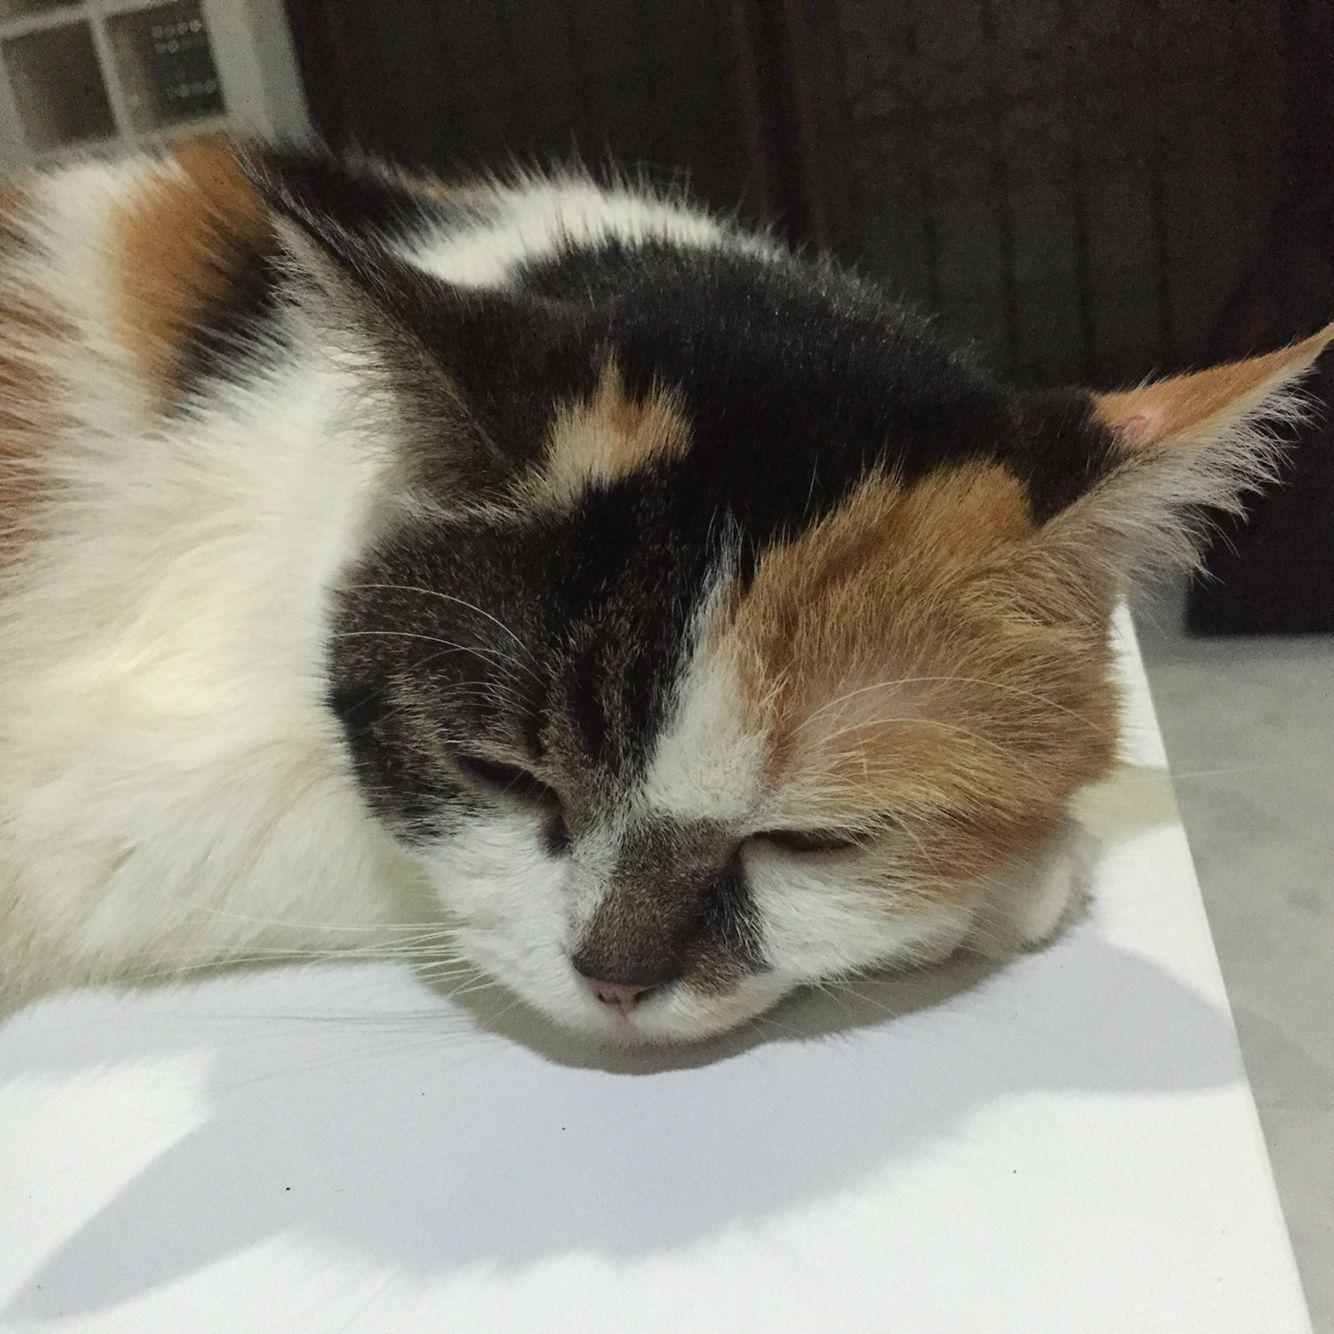 My cute cat.